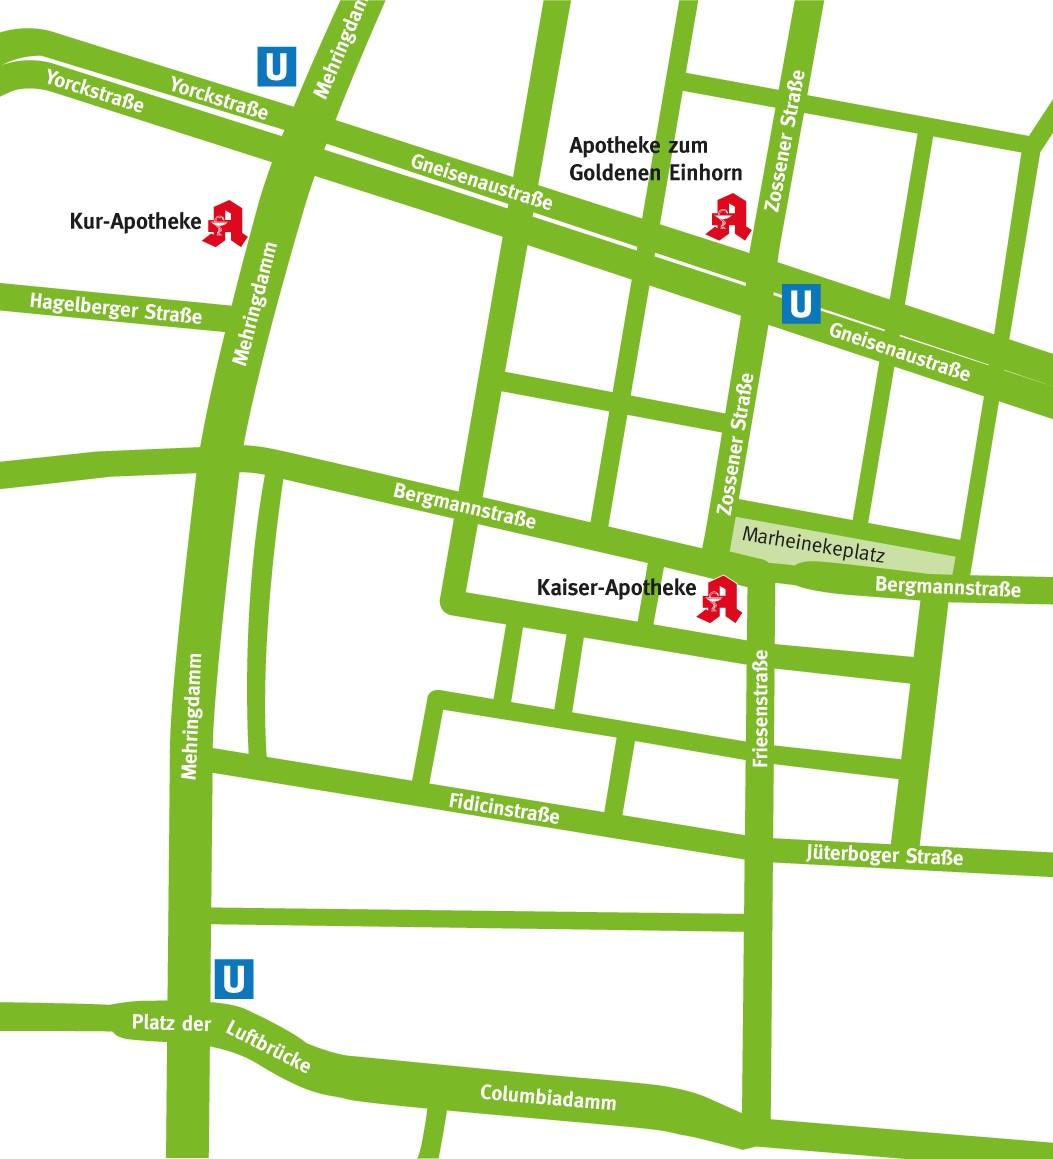 Straßenkarte Kaiser-Apotheken-Verbund Berlin, Kreuzberg 61